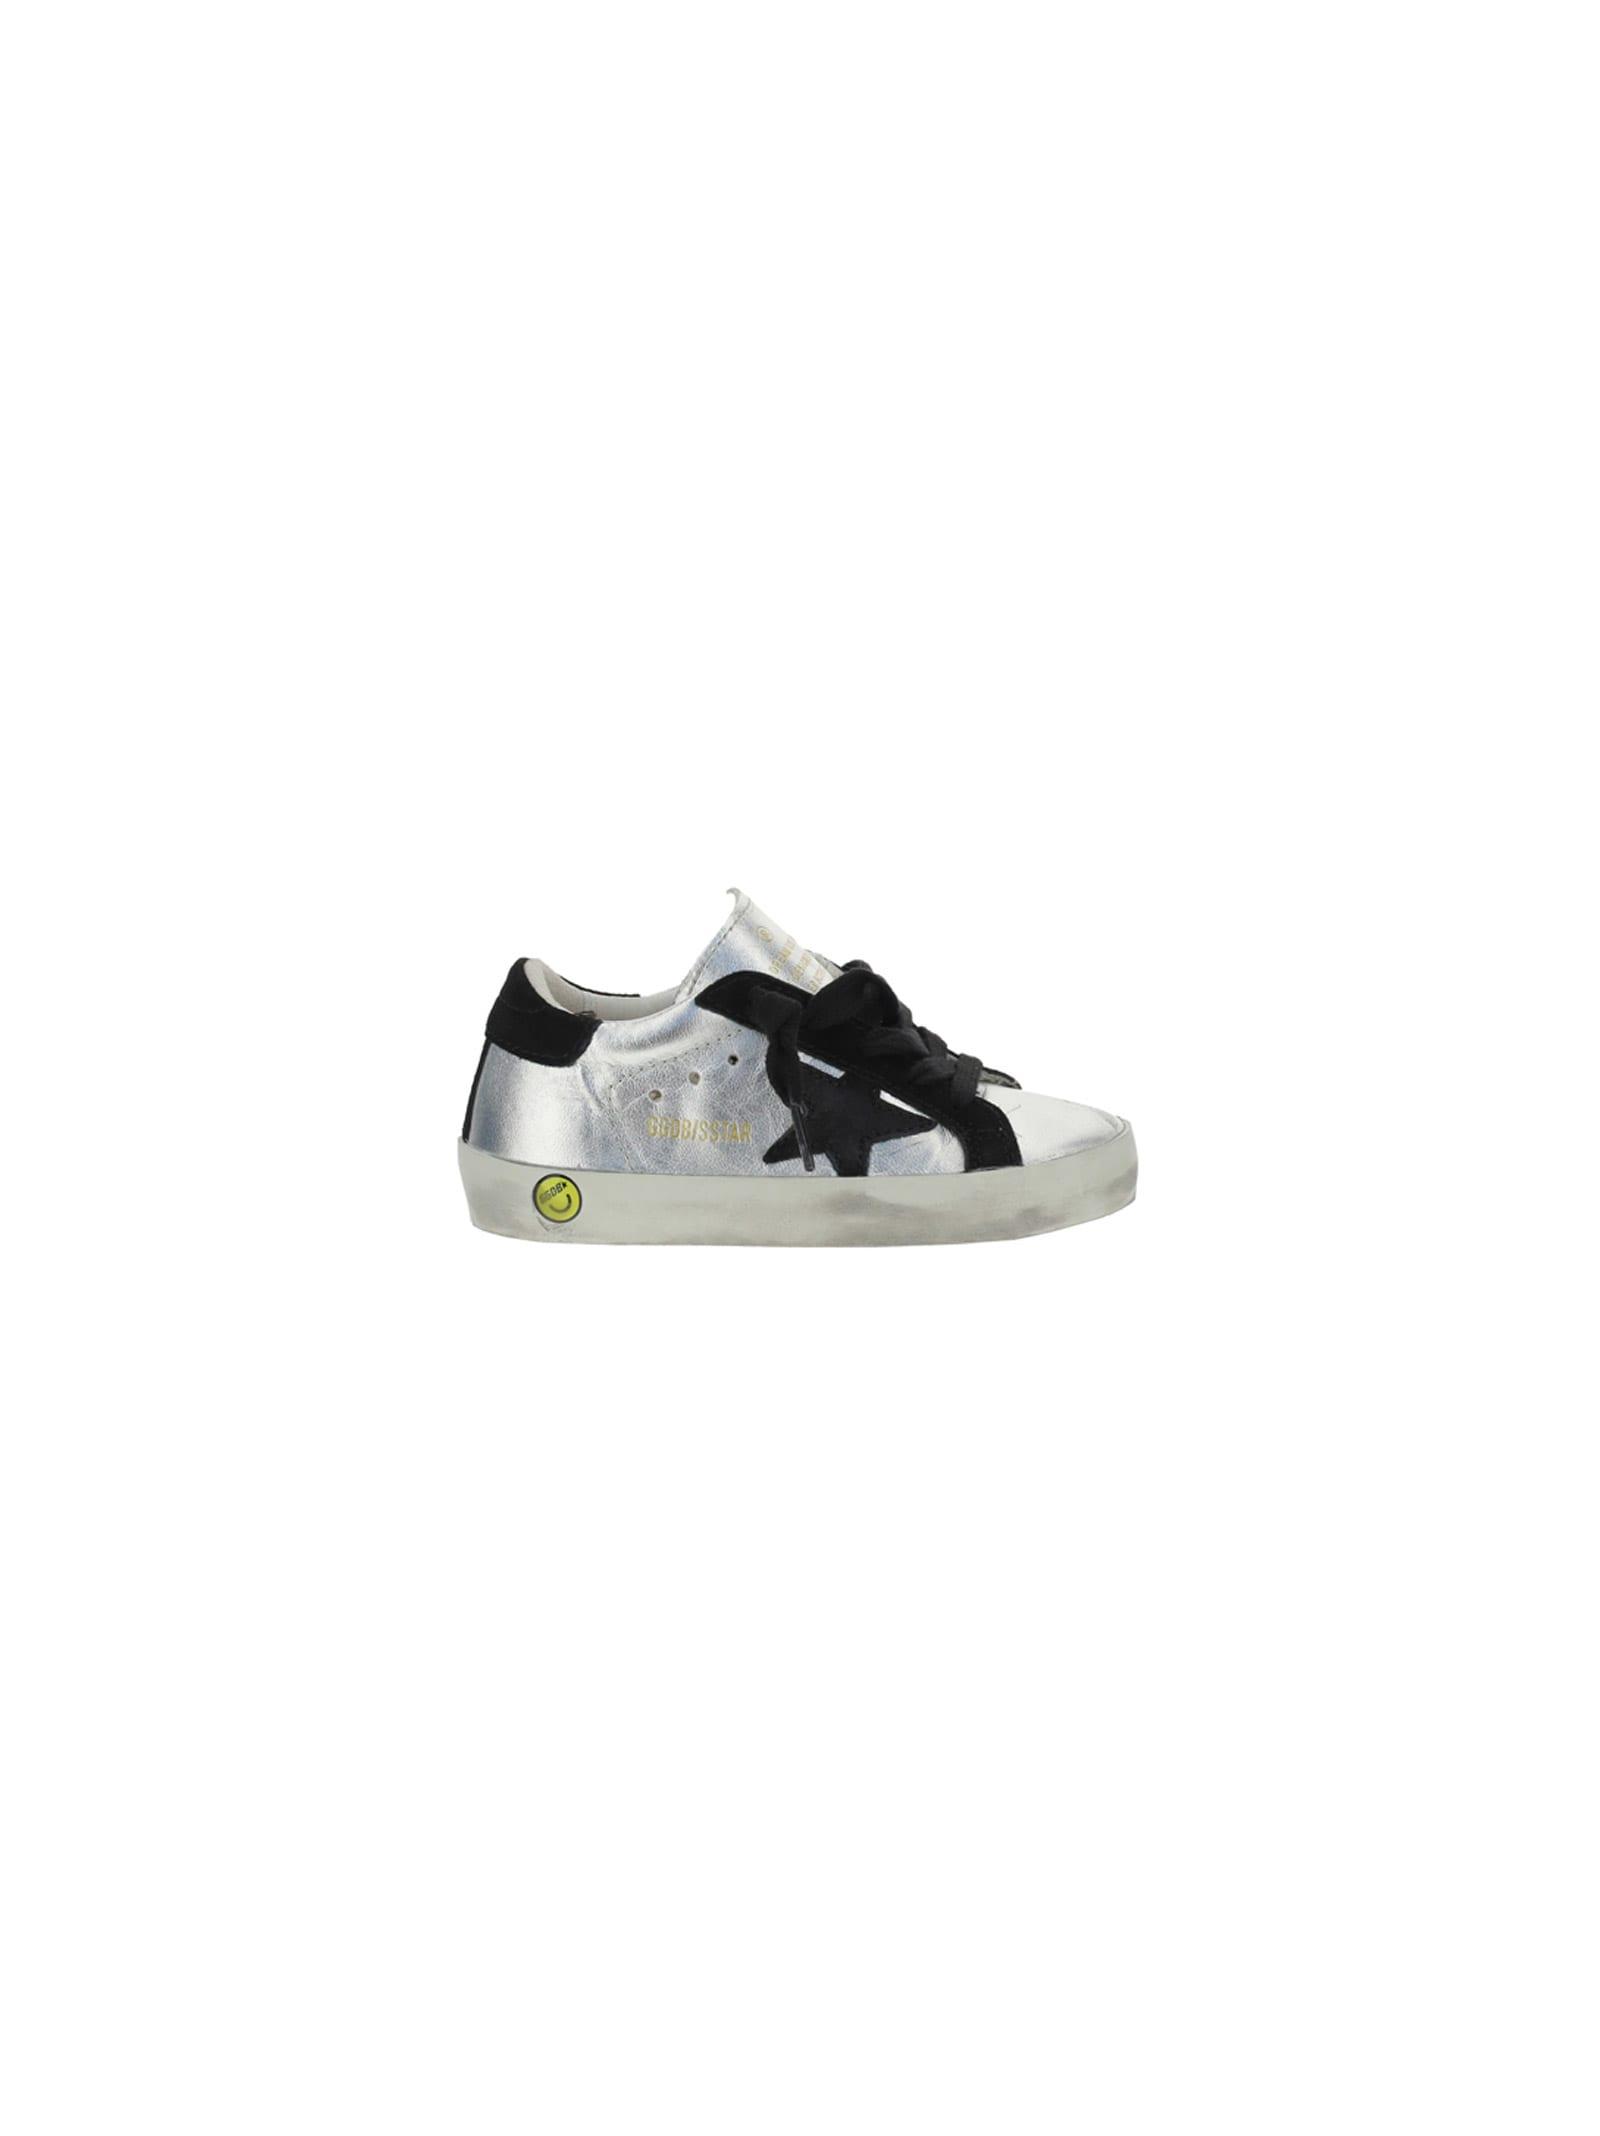 Golden Goose Superstar Sneakers For Girl